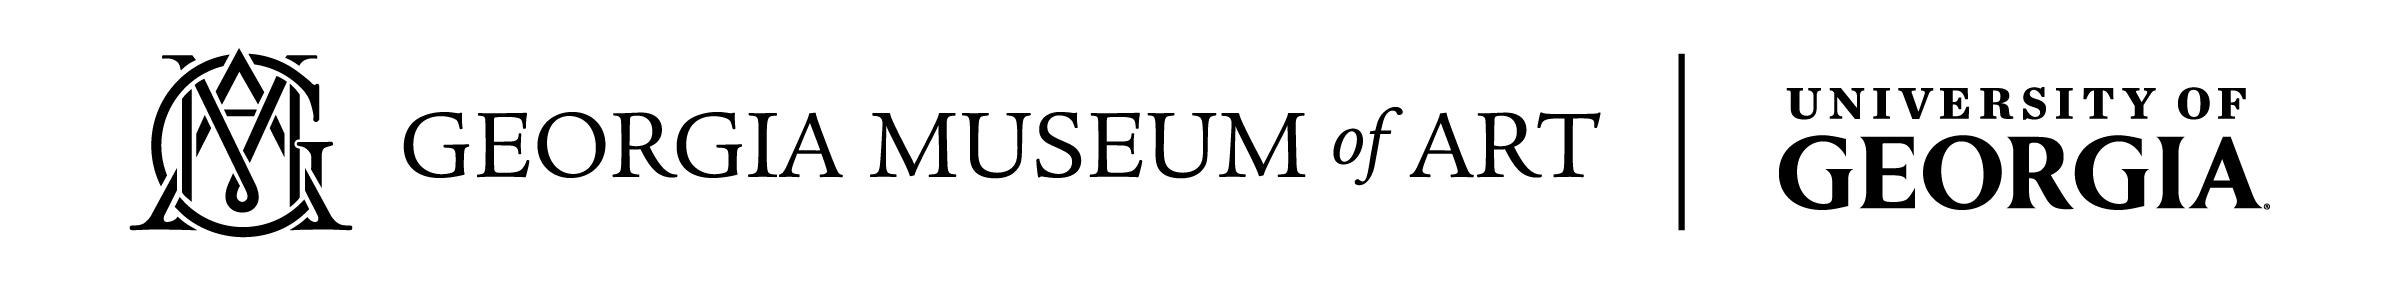 museum-university-logo-versions.jpg